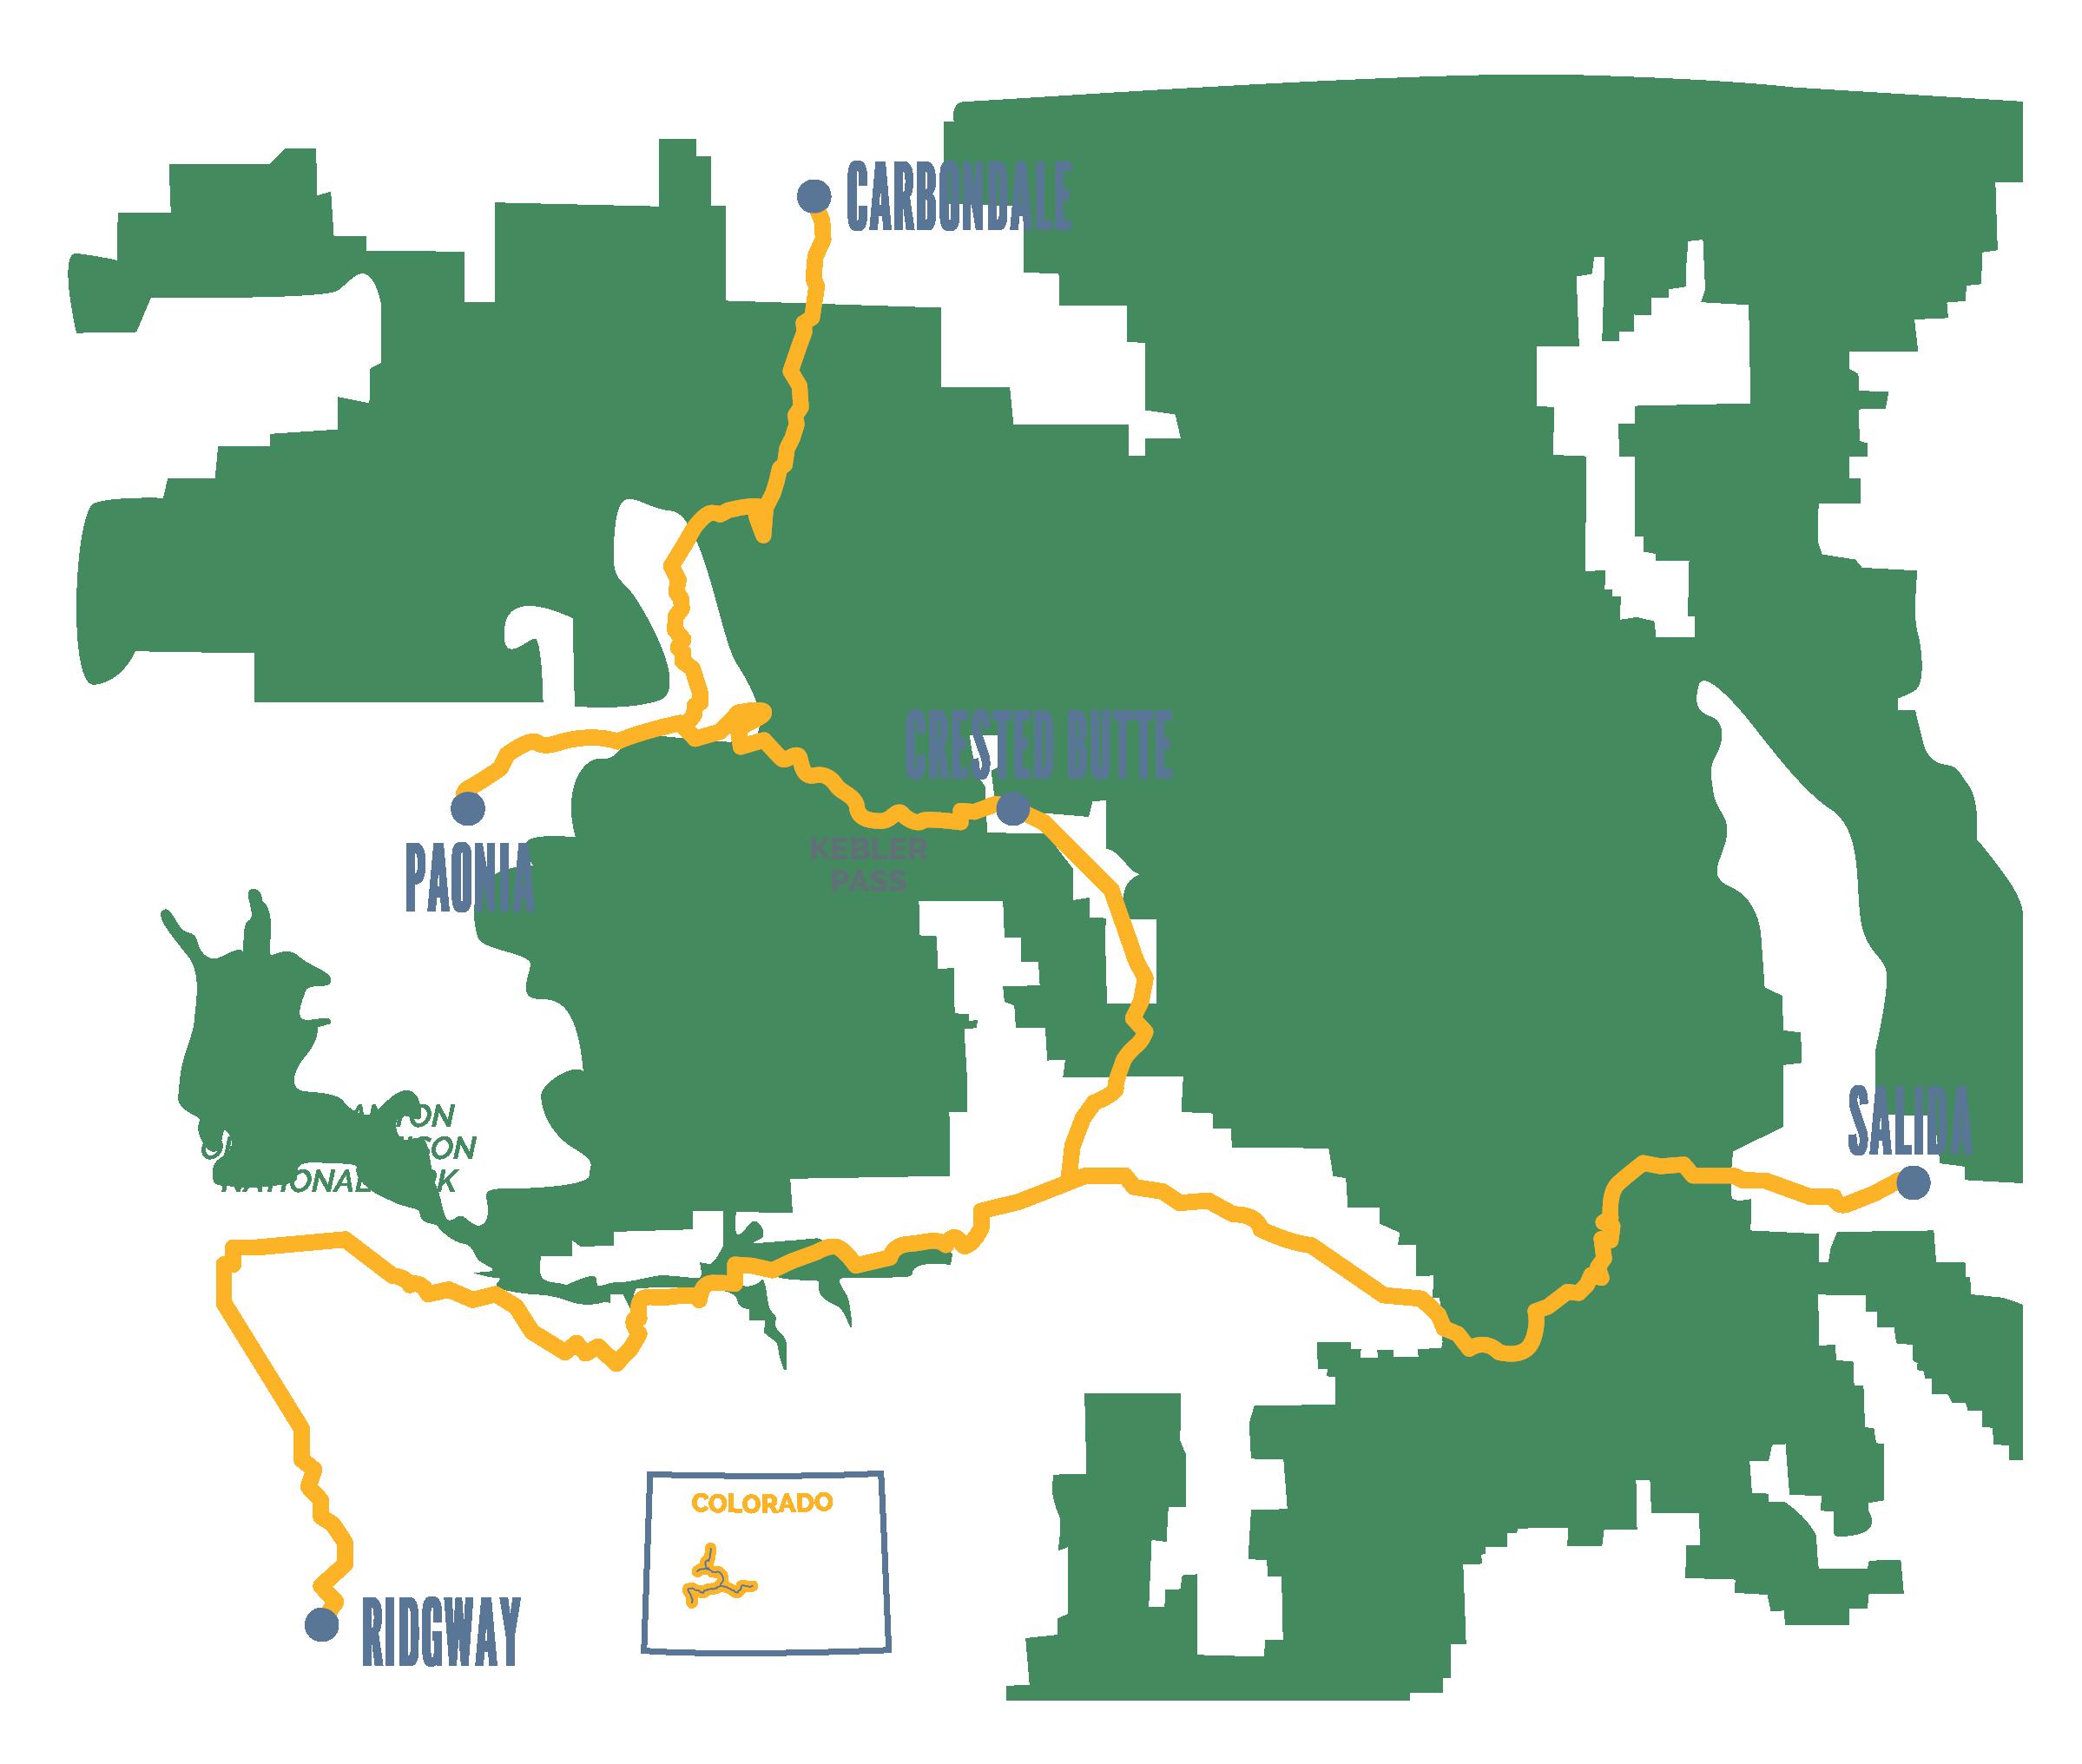 Colorado Creative Corridor Itinerary Map